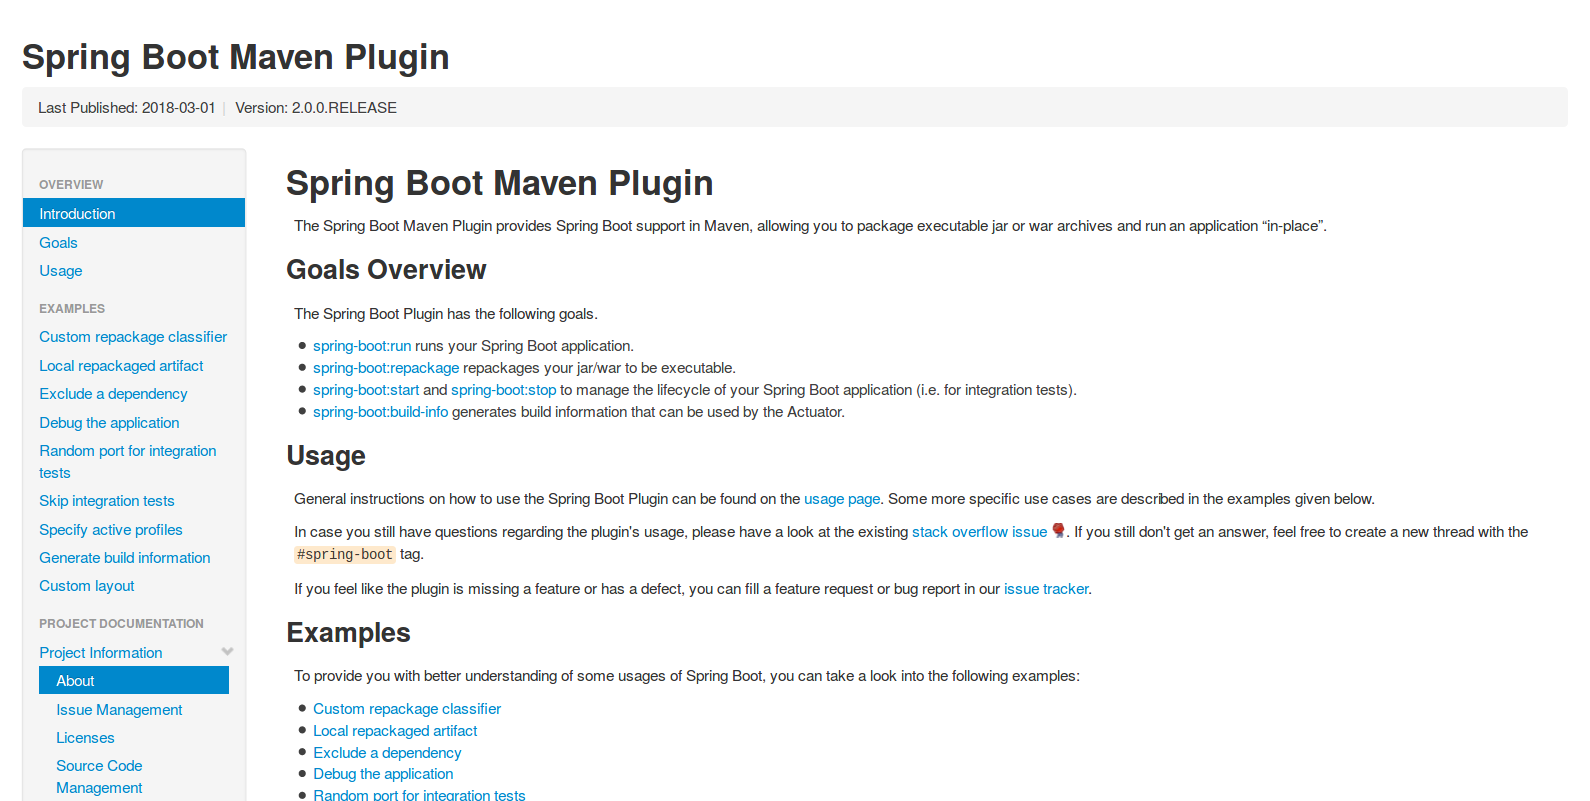 Spring Boot Maven plugin Guide